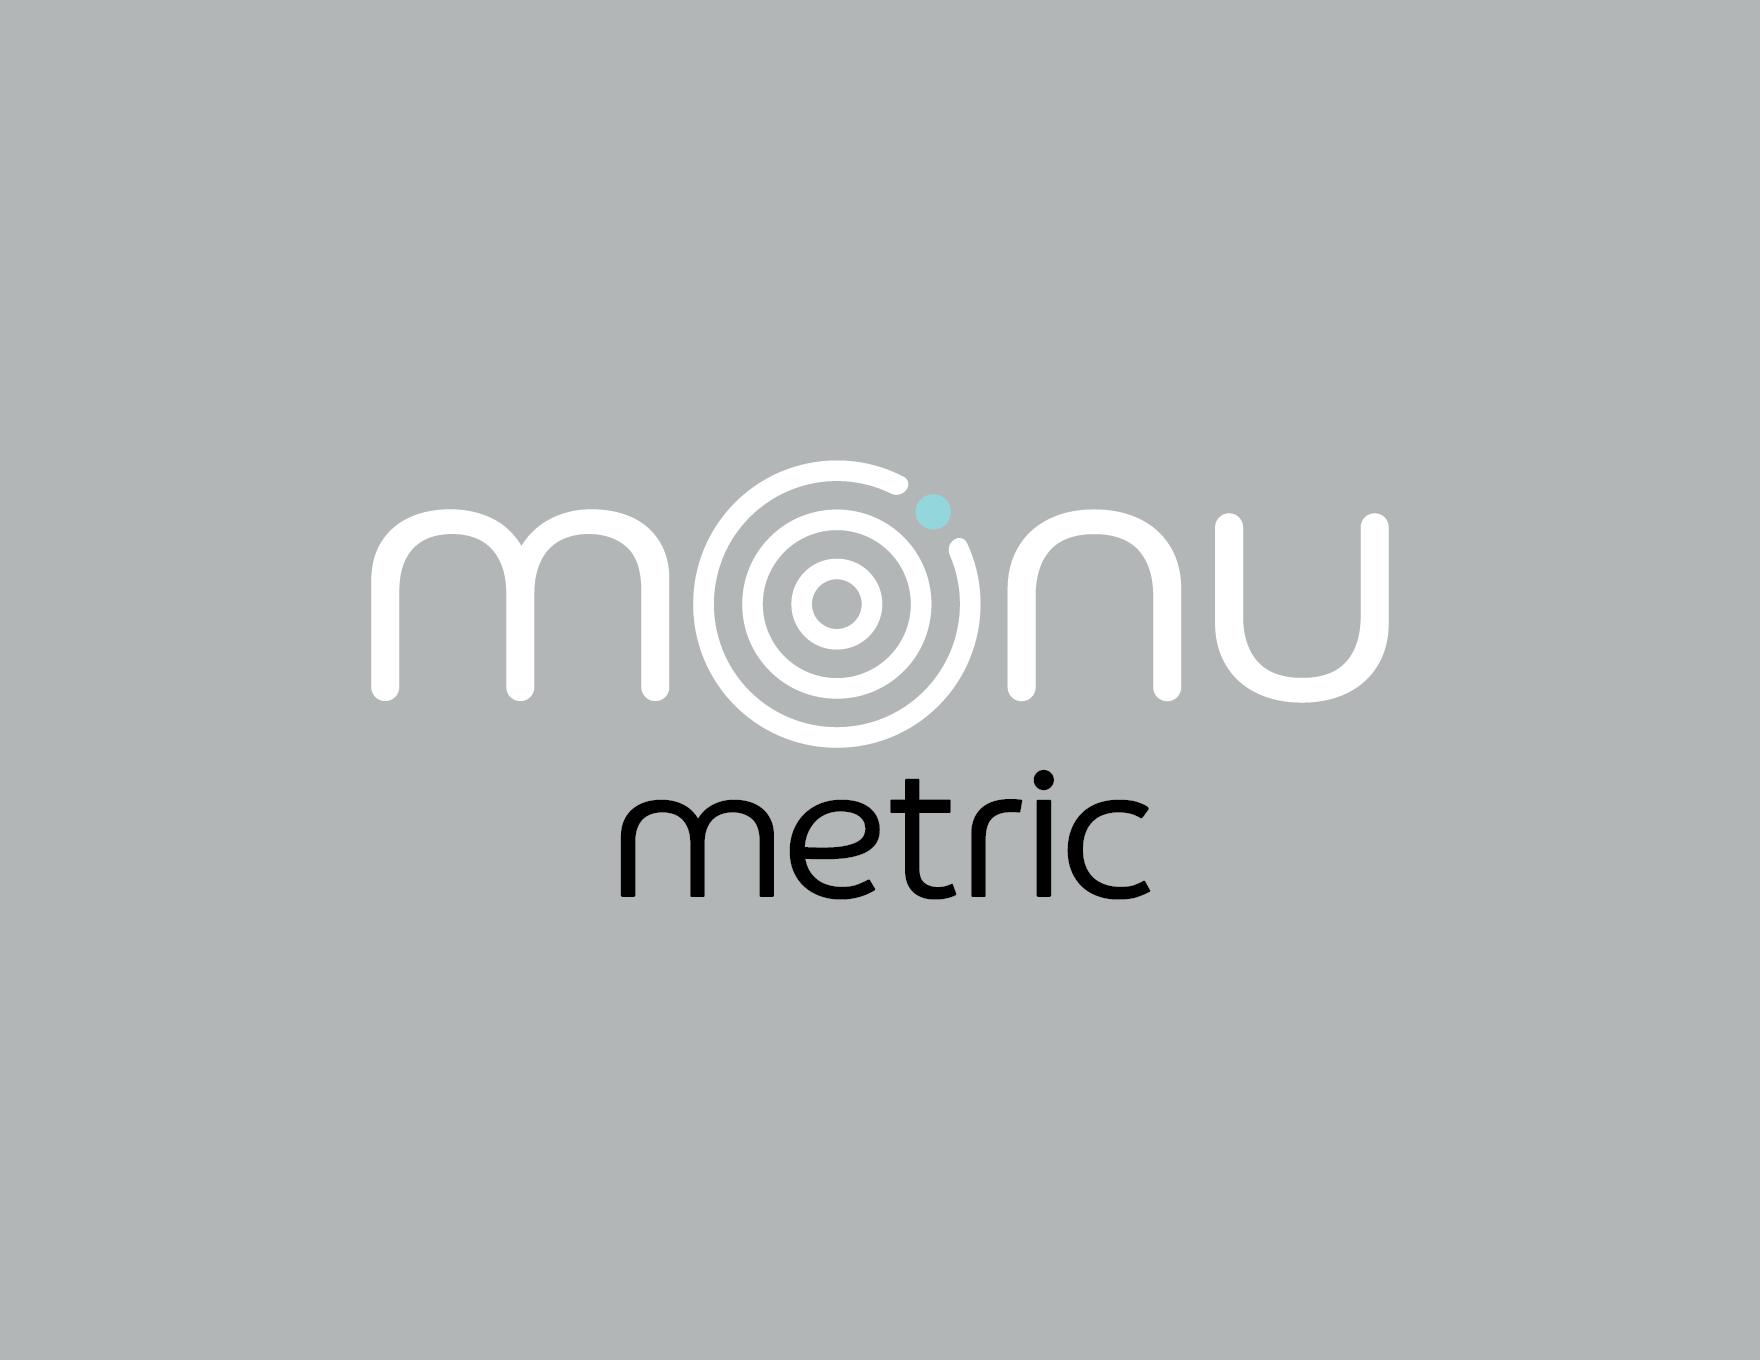 Monumetric-Artboards_MONU-STACKED-Silver (1)